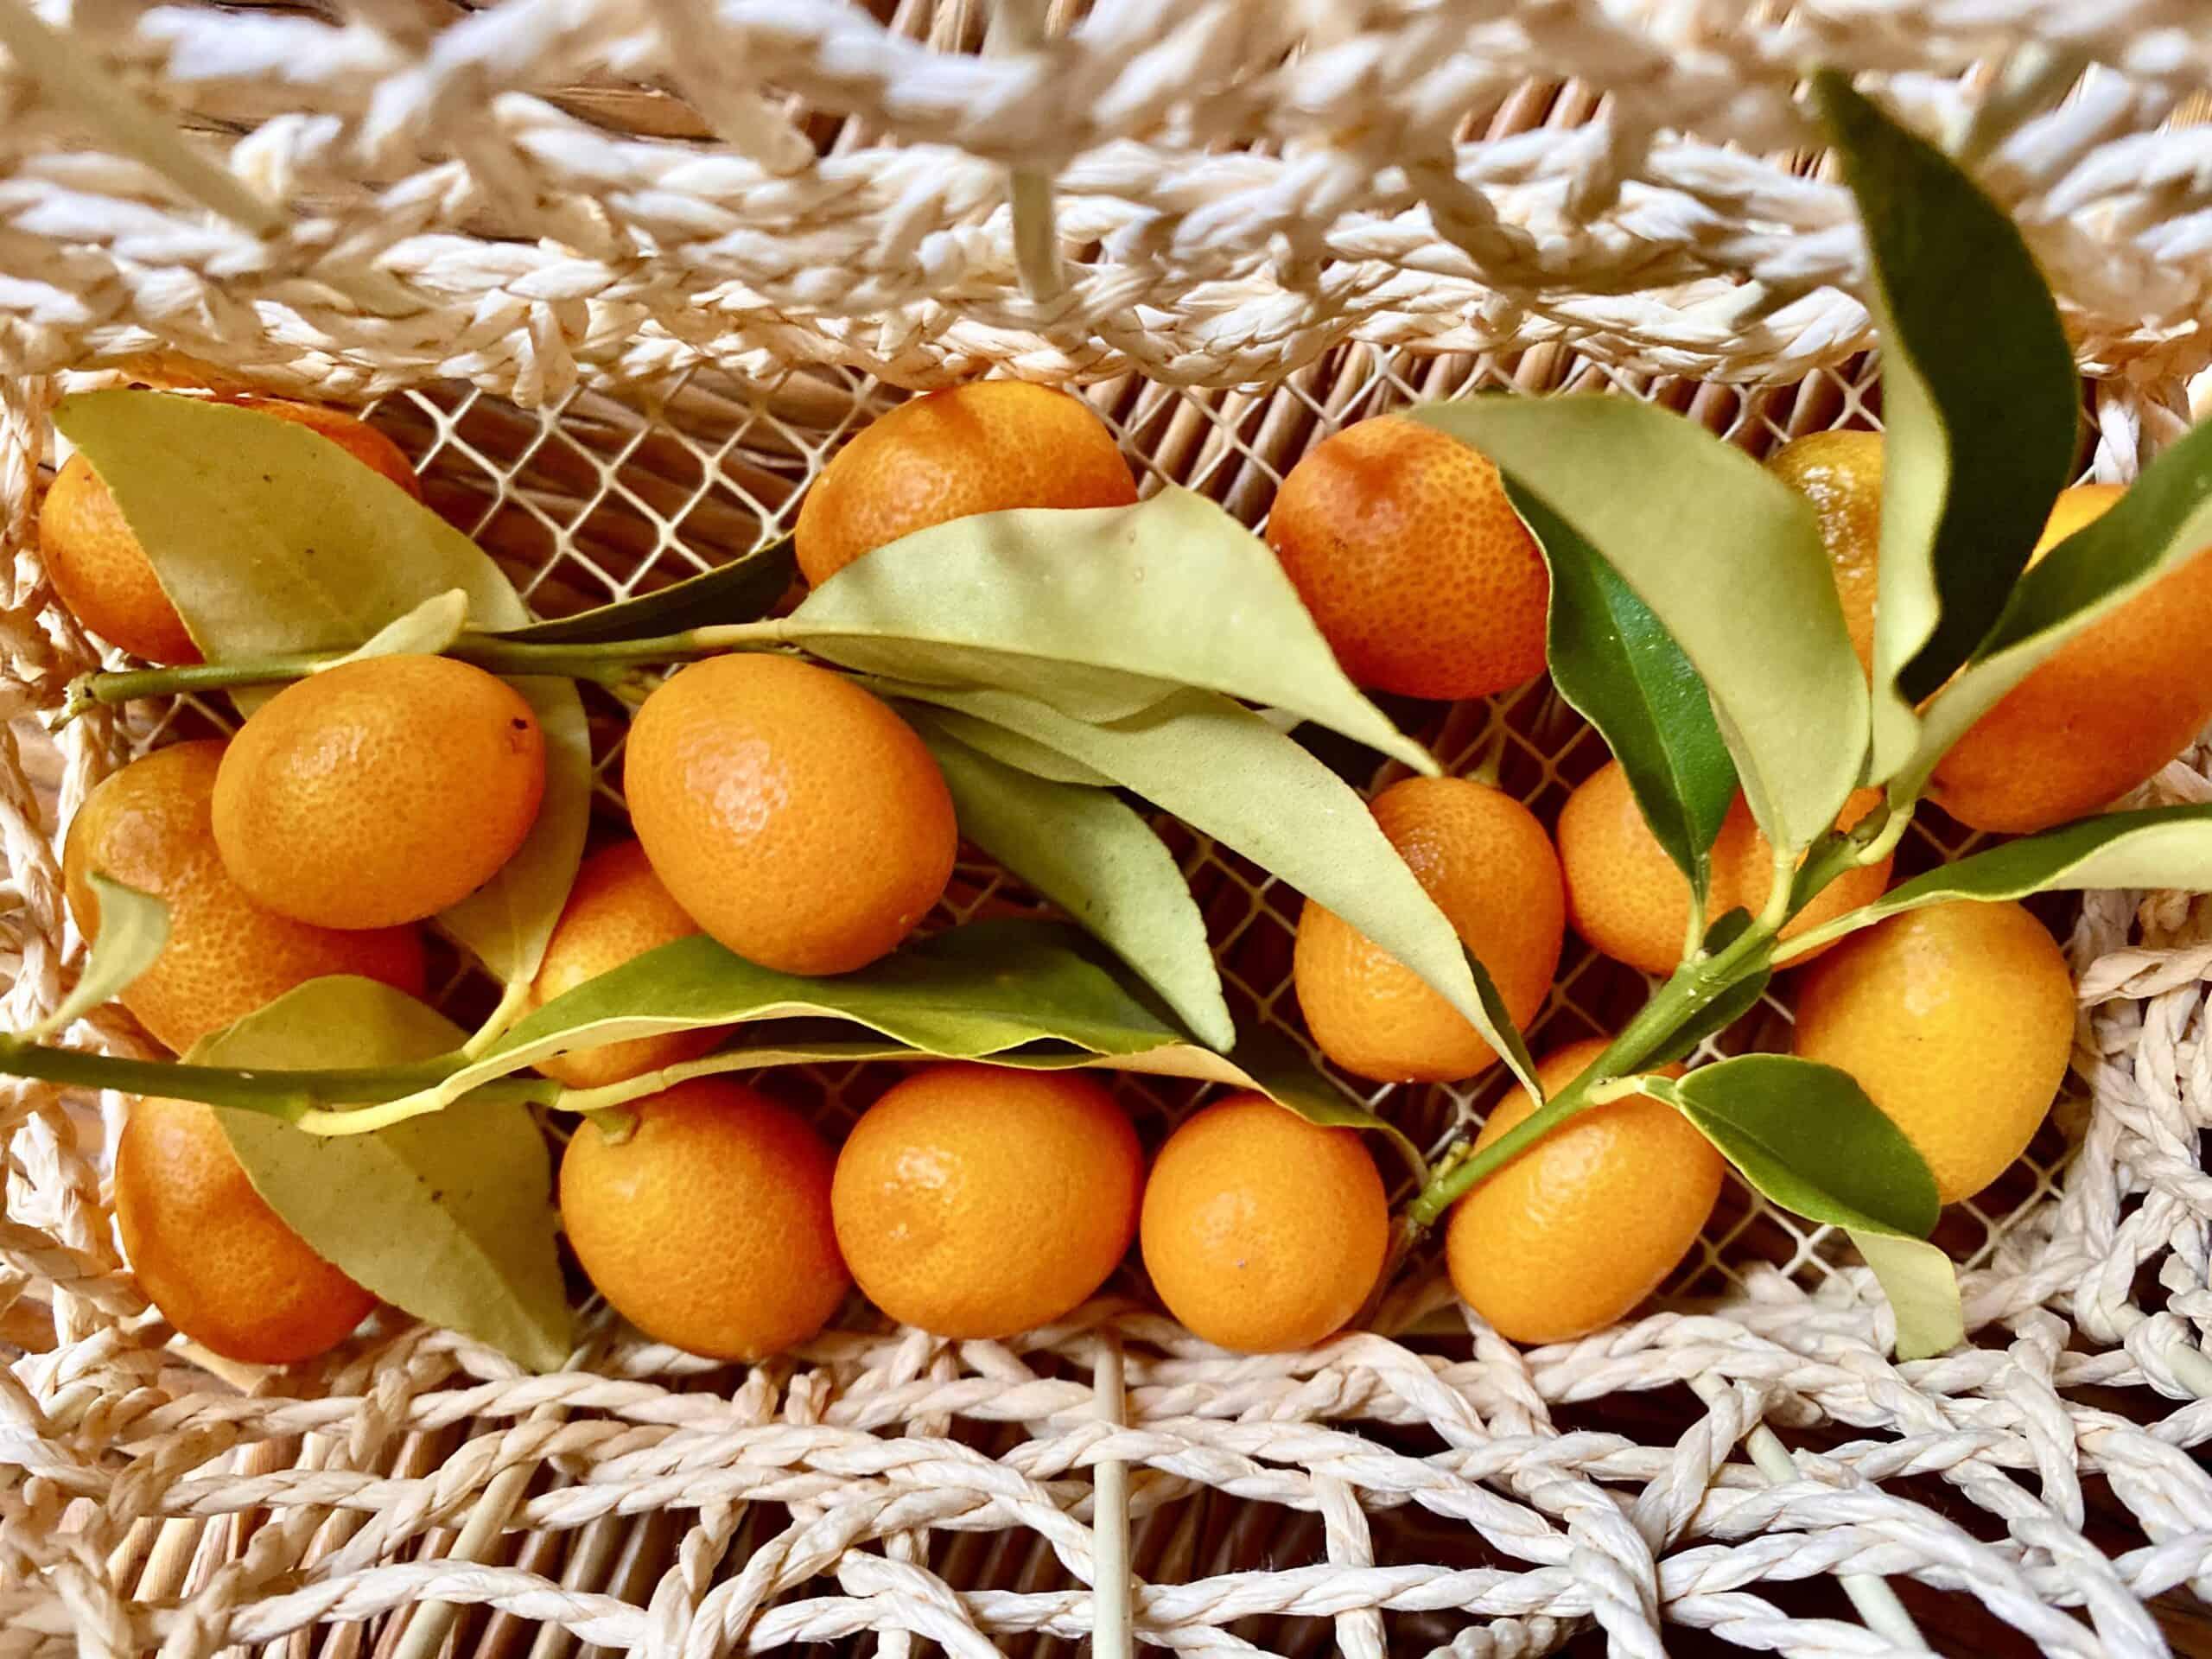 kumquats in a basket